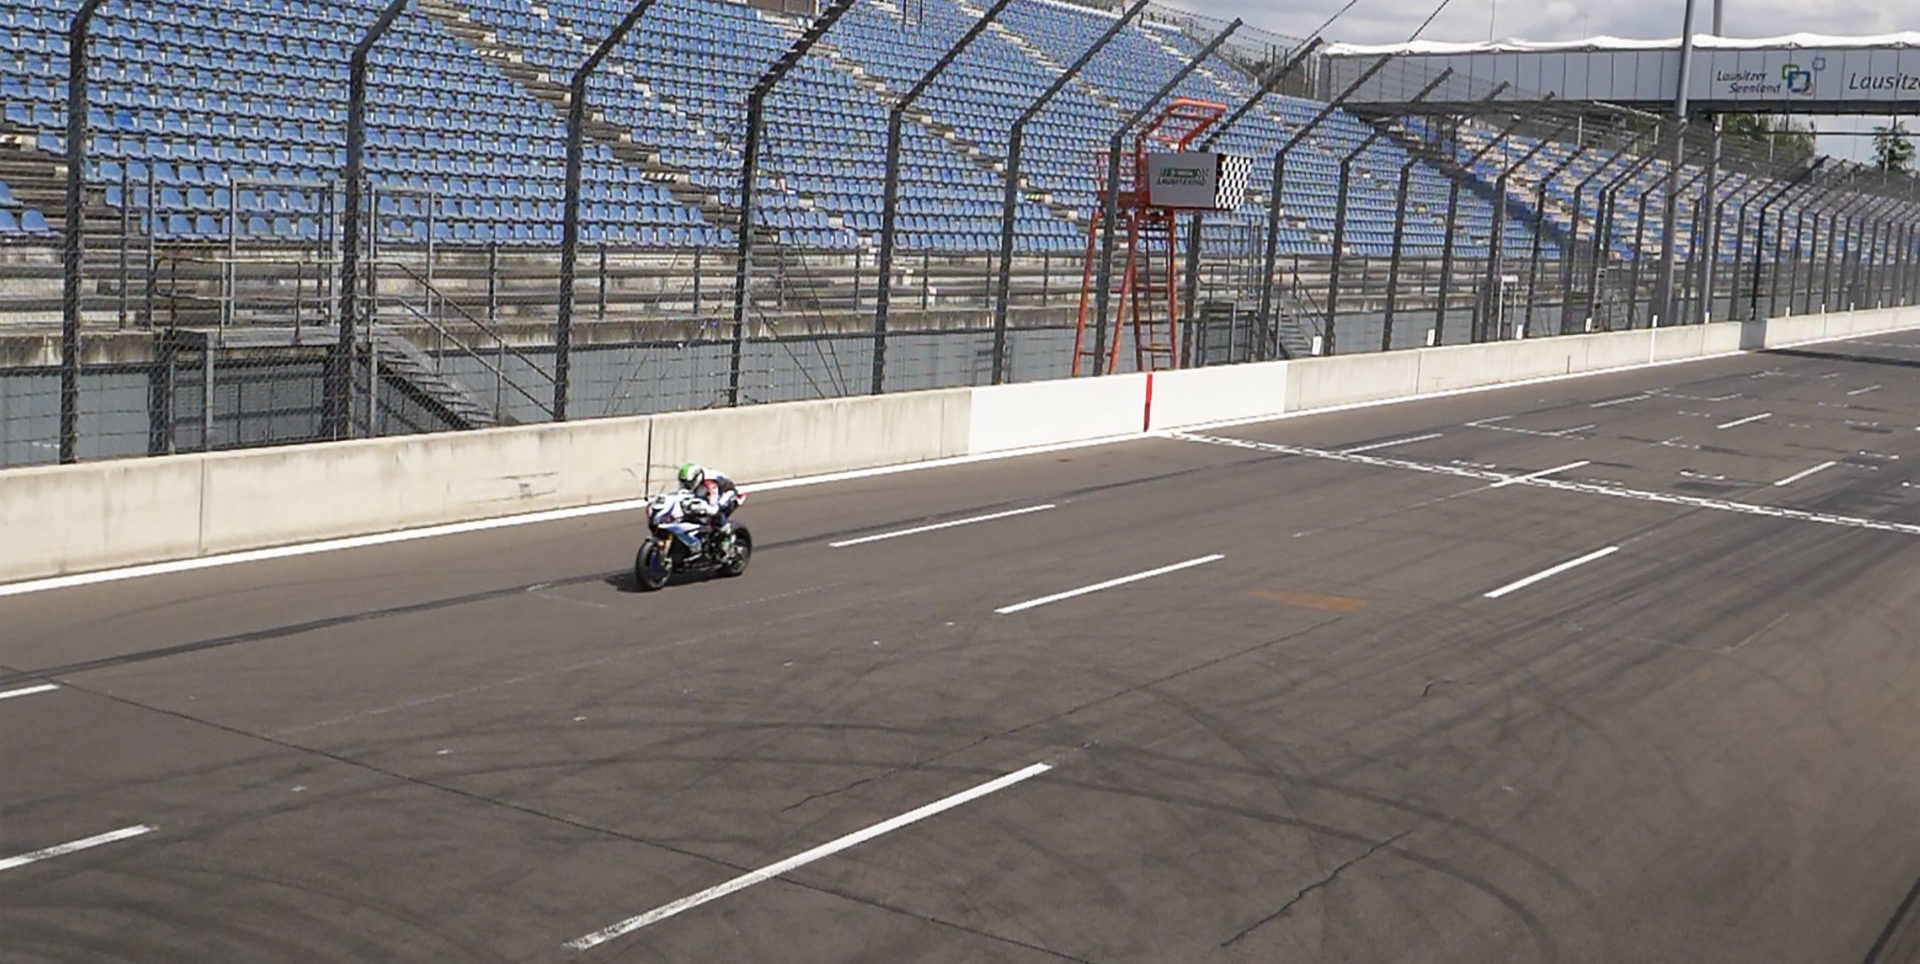 Eugene Laverty (50) testing on his BMW World Superbike at Lausitzring, in Germany. Photo courtesy BMW Motorrad WorldSBK Team.